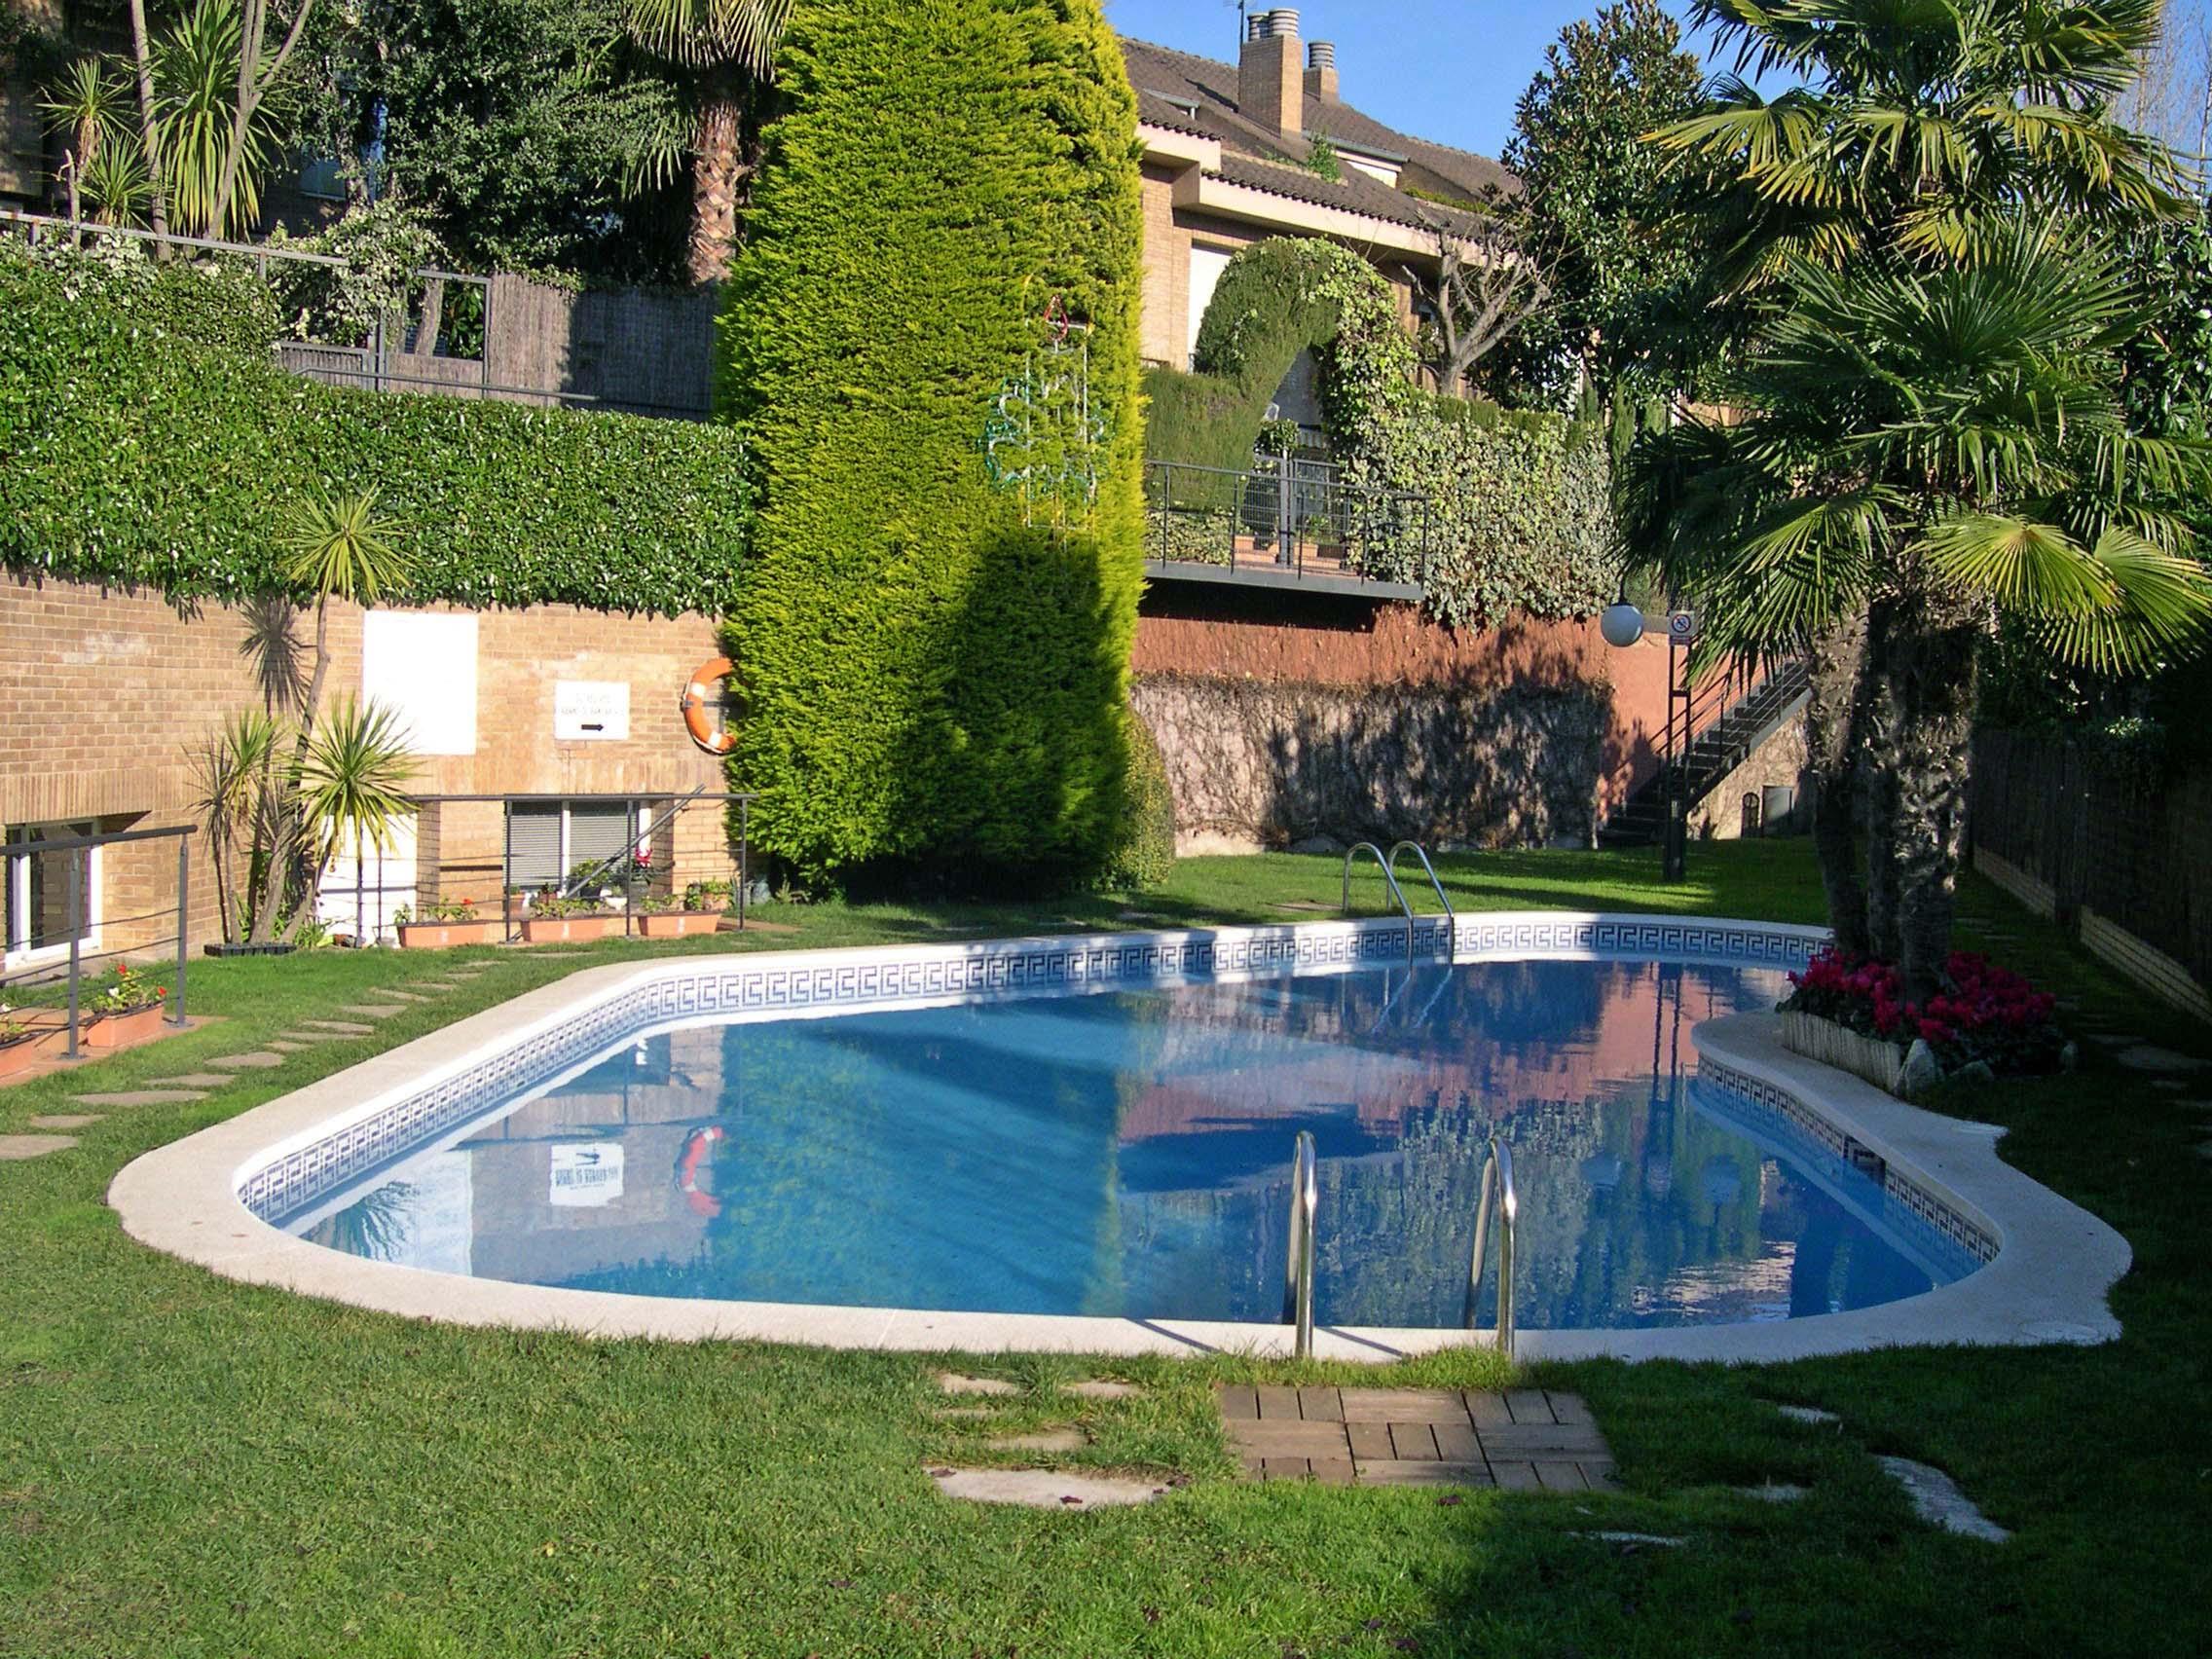 Таунхаус в Барселона, площадь 300 м², 4 спальни